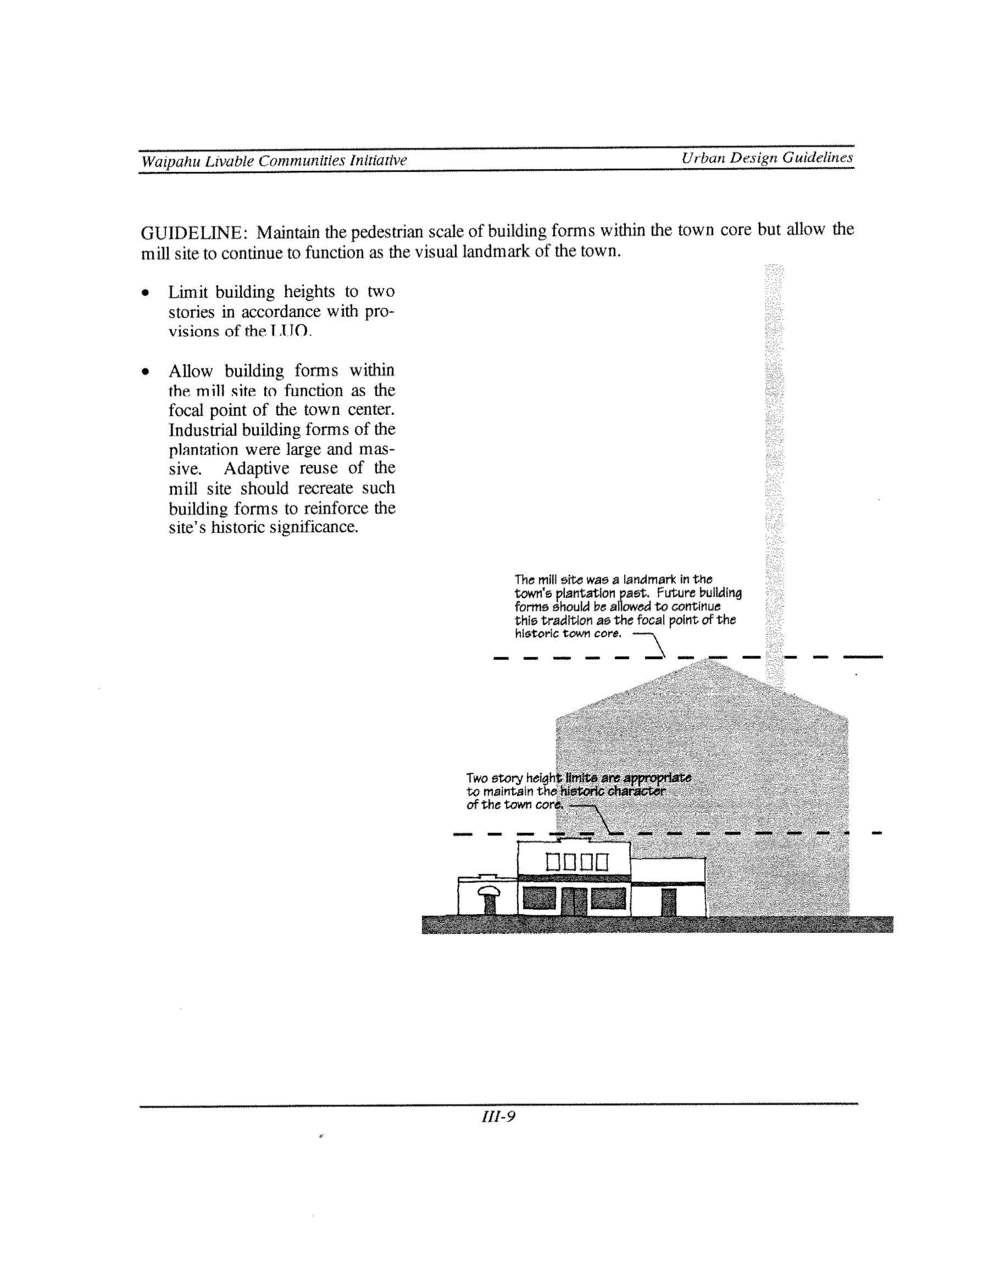 160531_WaipahuLivableCommunities(1998)_Page_099.jpg